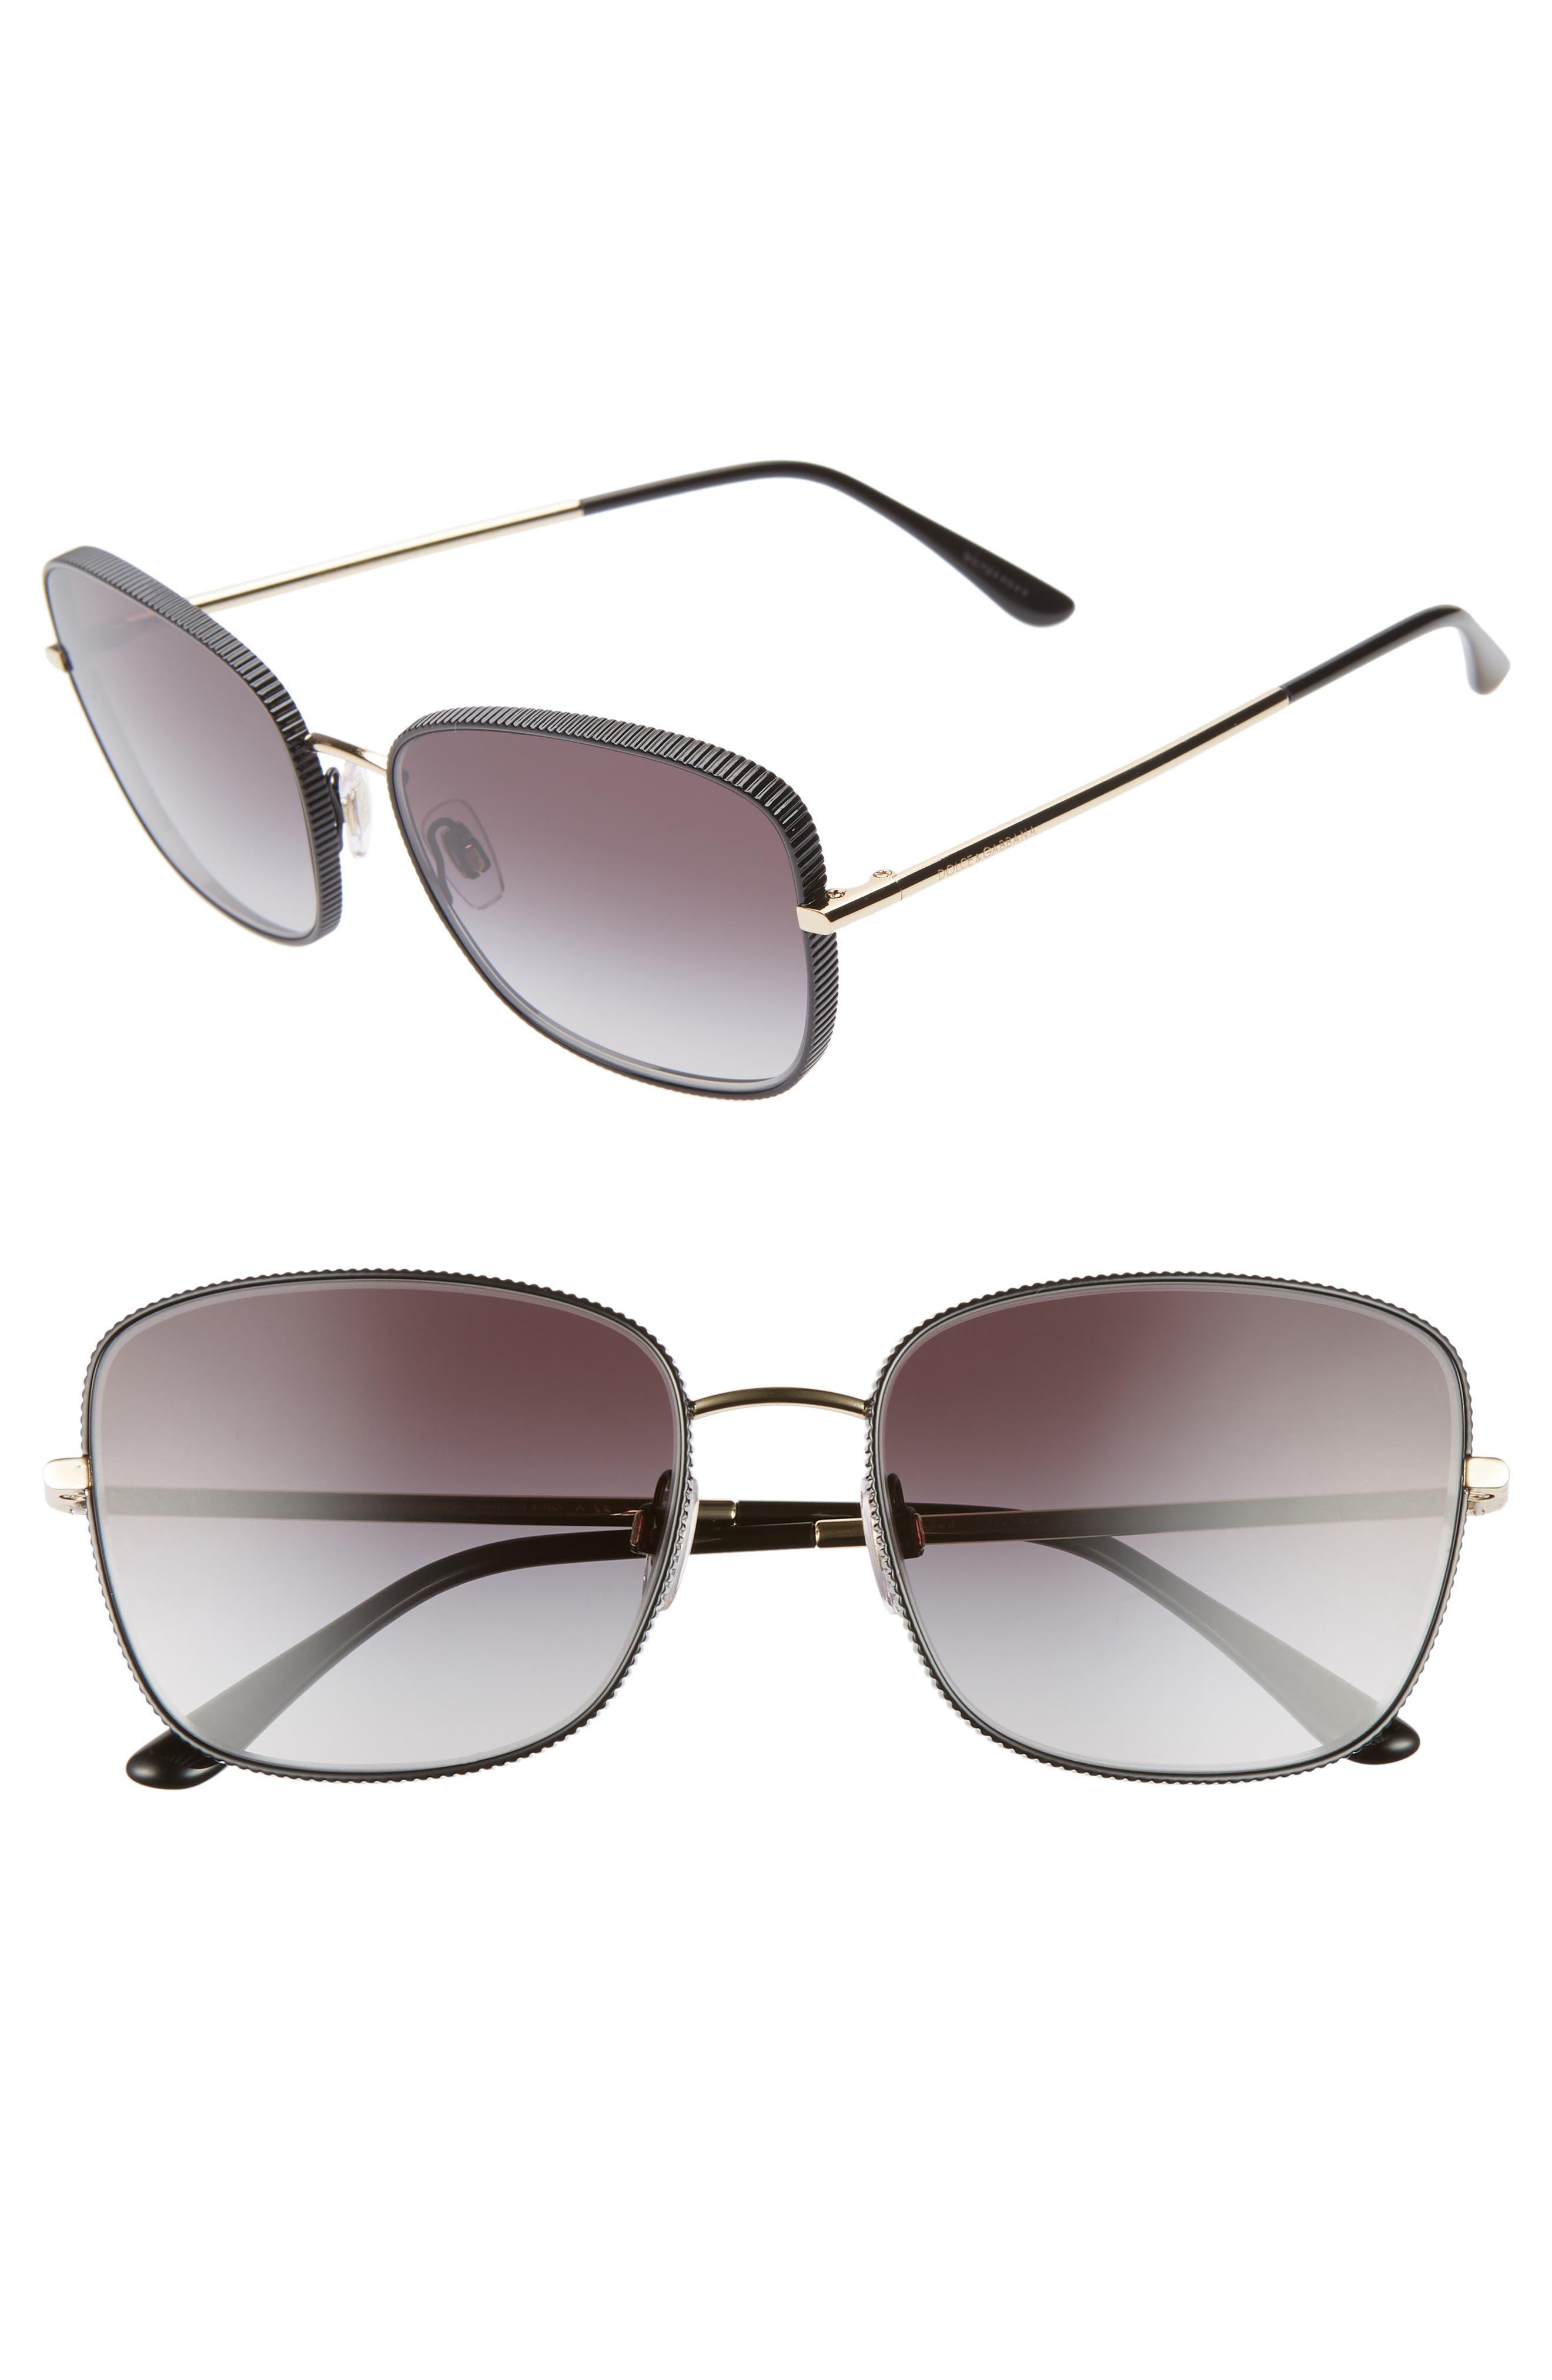 Dolce & gabbana 5m Gradient Butterfly Sunglasses - Black/ Gold